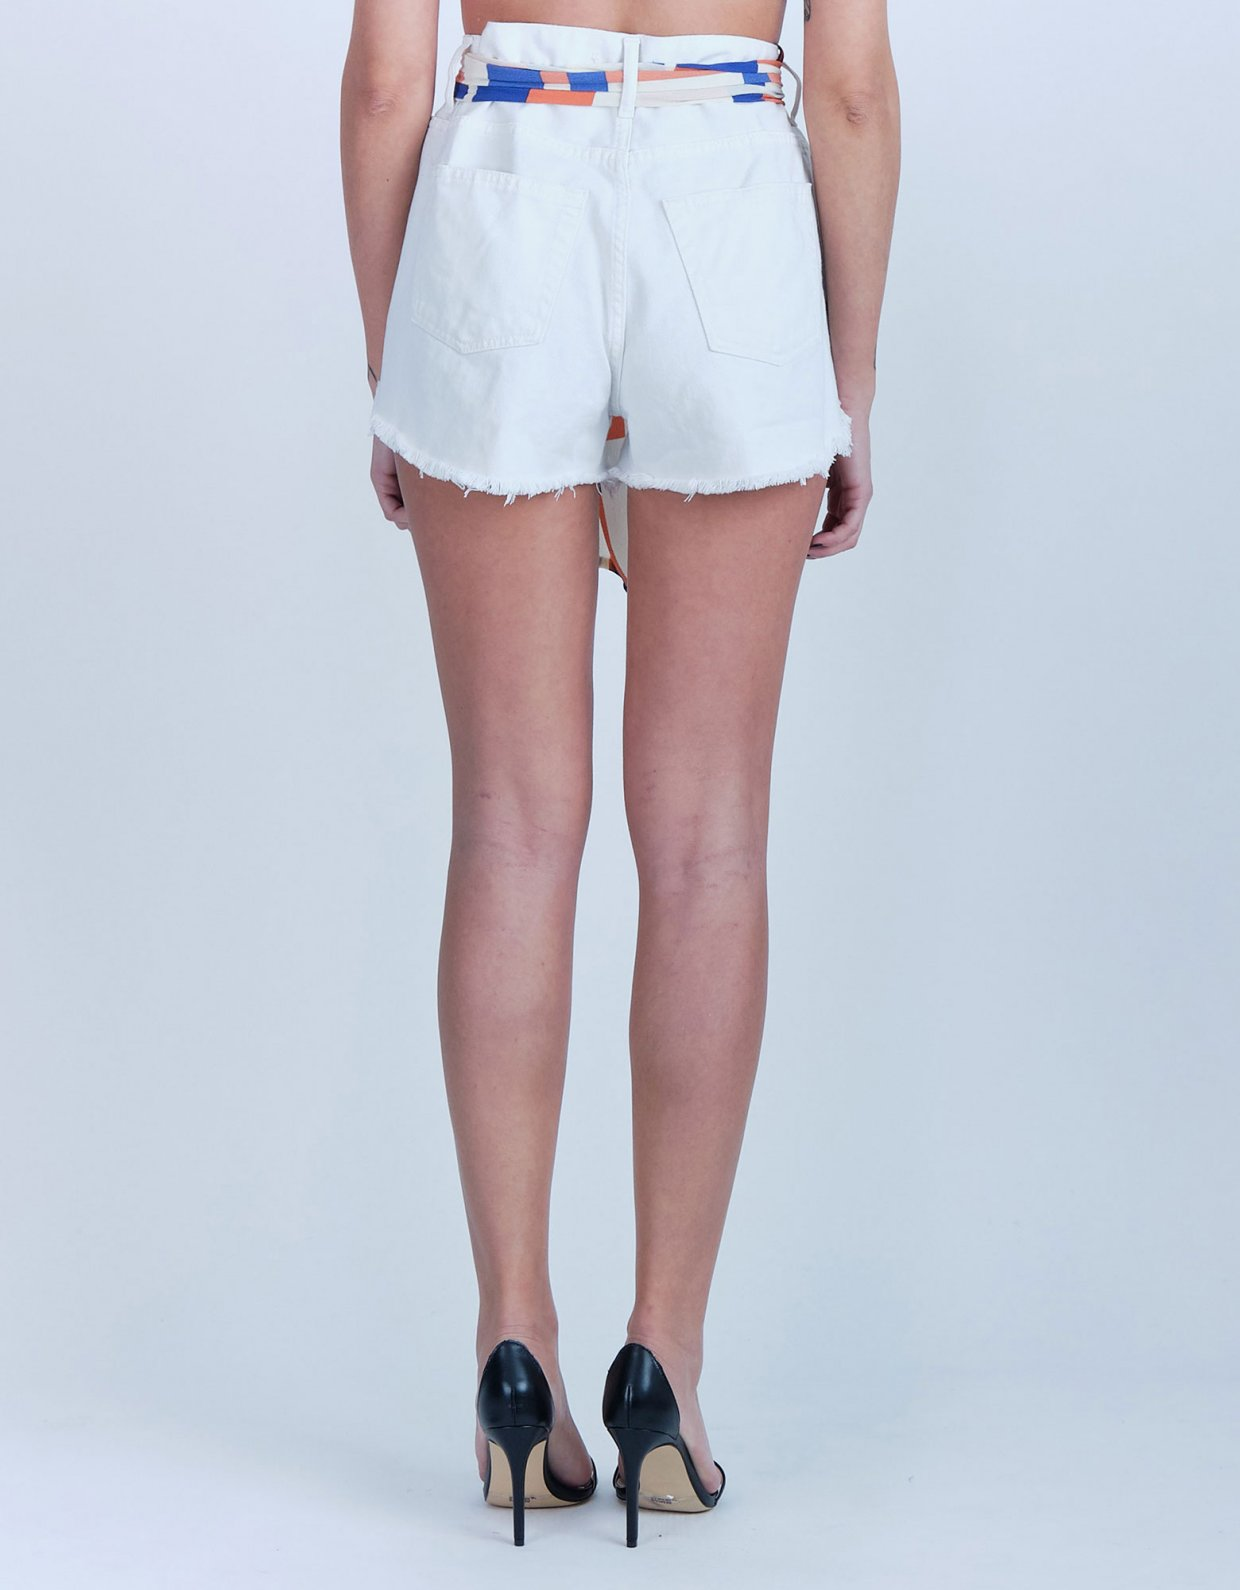 Salt & Pepper Ion off white ripped denim shorts